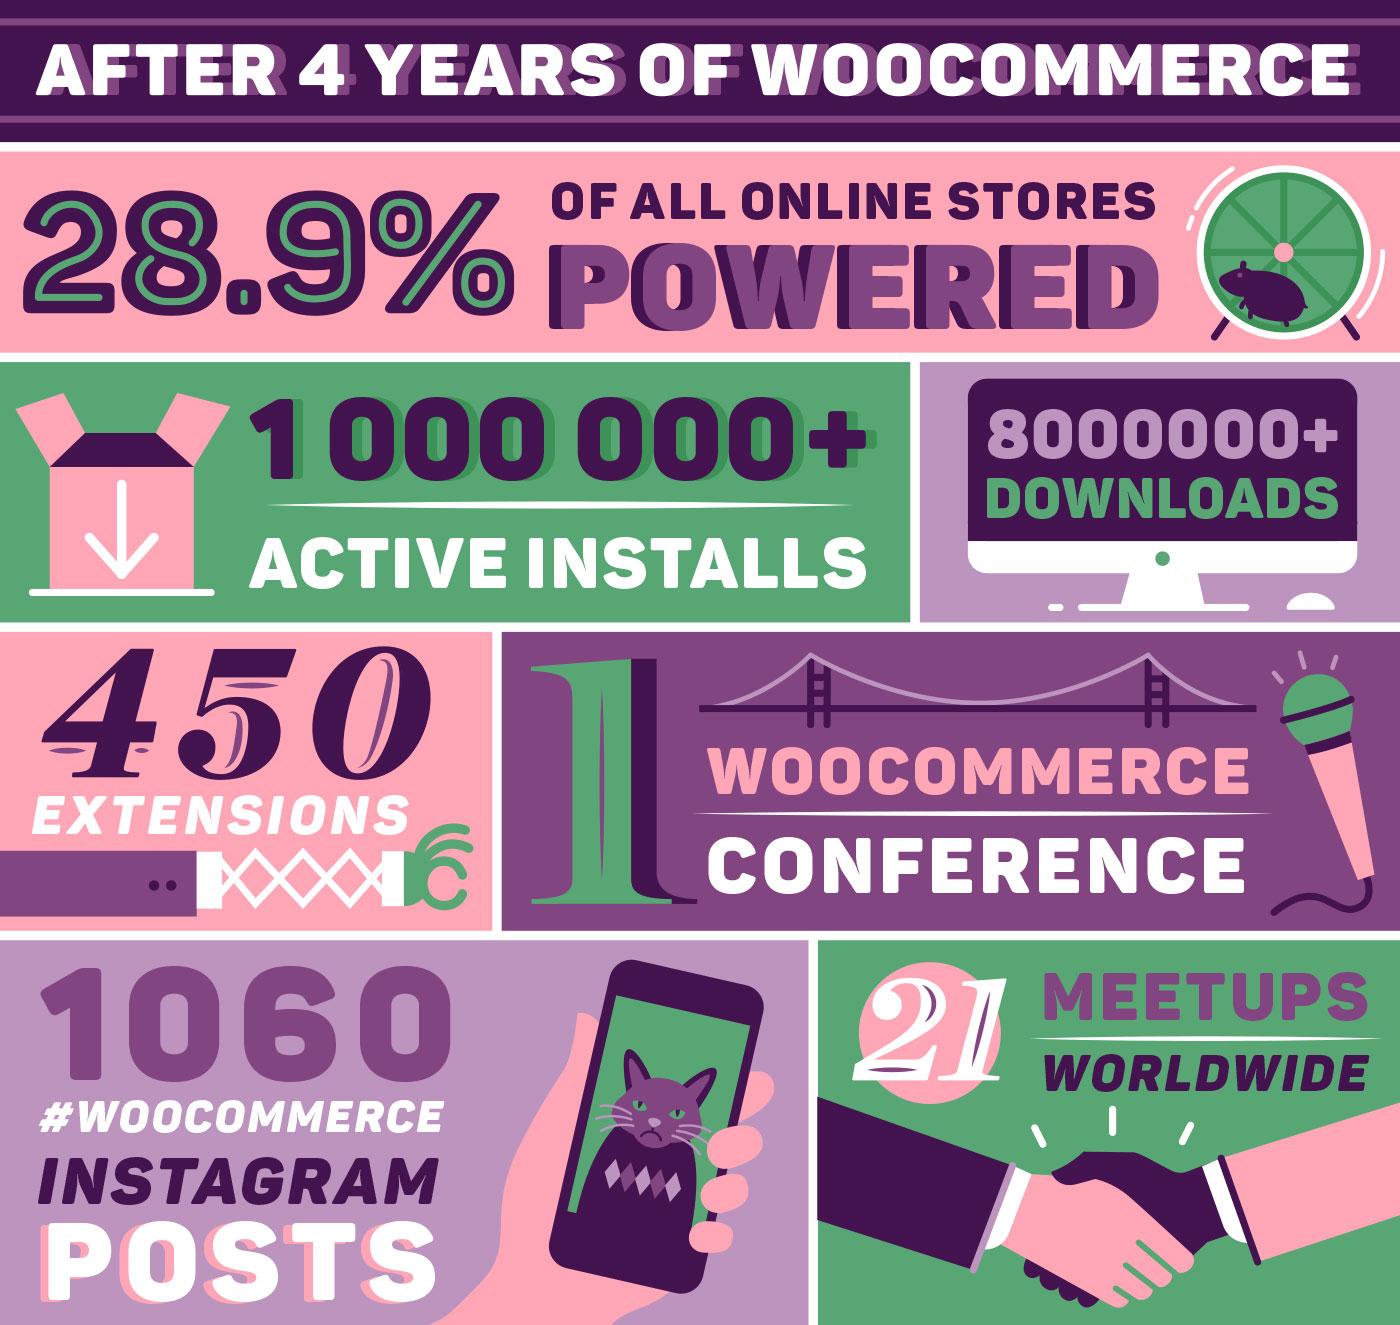 bday7-blog-woocommerce@2x